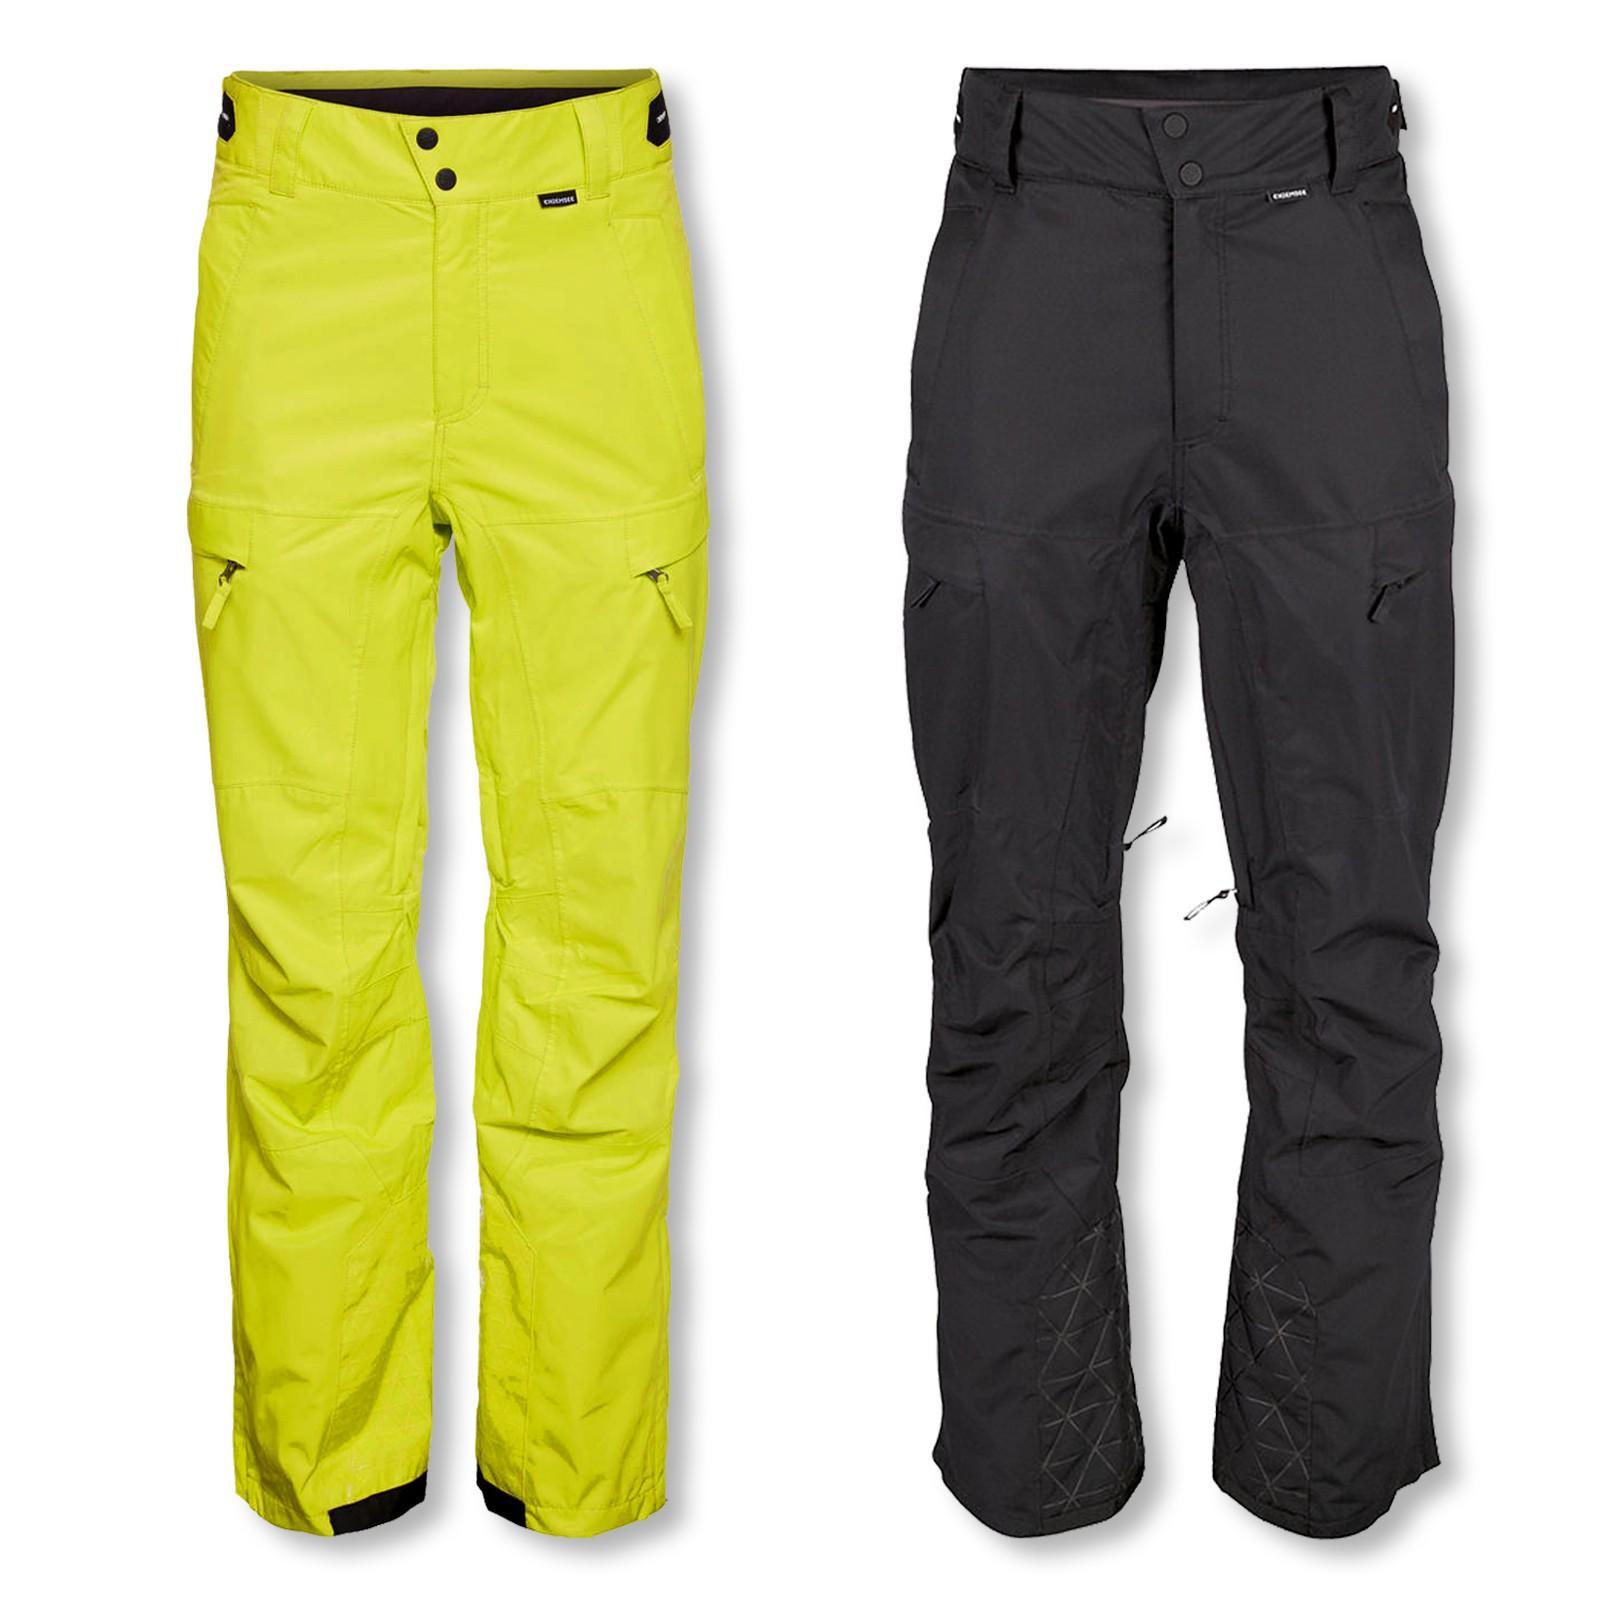 Chiemsee Herren Skihose Snow Pants Kolja 2090804 M L XL in schwarz